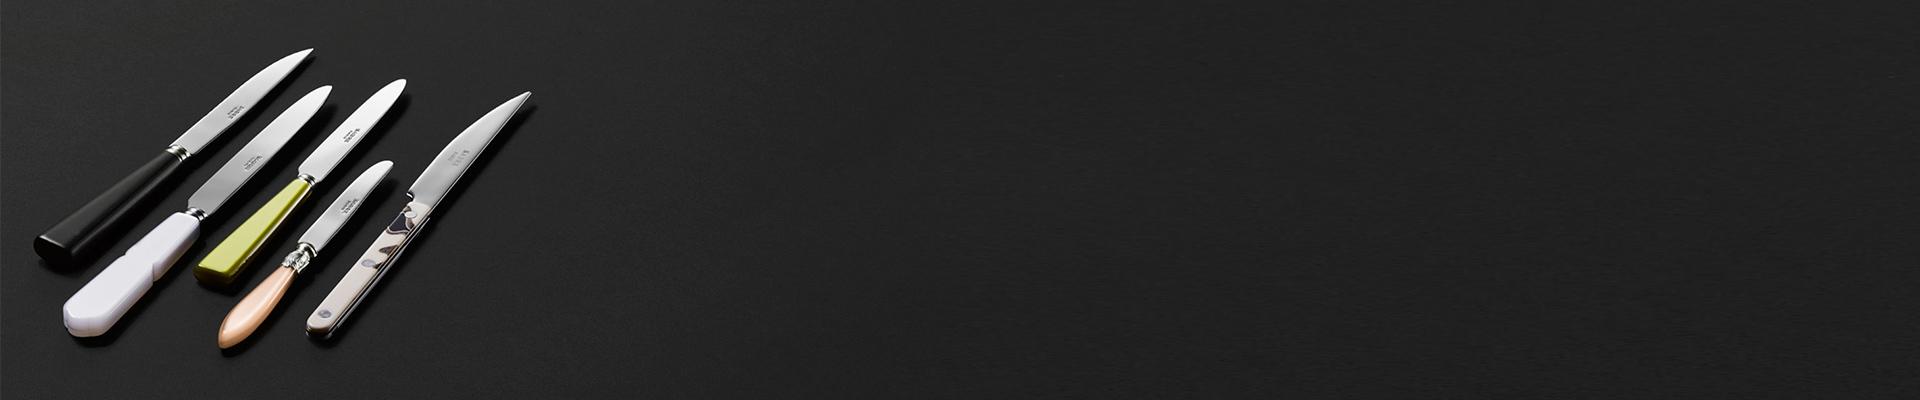 Sabre Paris,Tableware,Tableware knife, fork, spoon, serving accessories, kitchen accessories, 餐刀,餐叉,咖啡匙,茶匙,點心叉,牛排刀,刀,叉,匙,餐具,餐